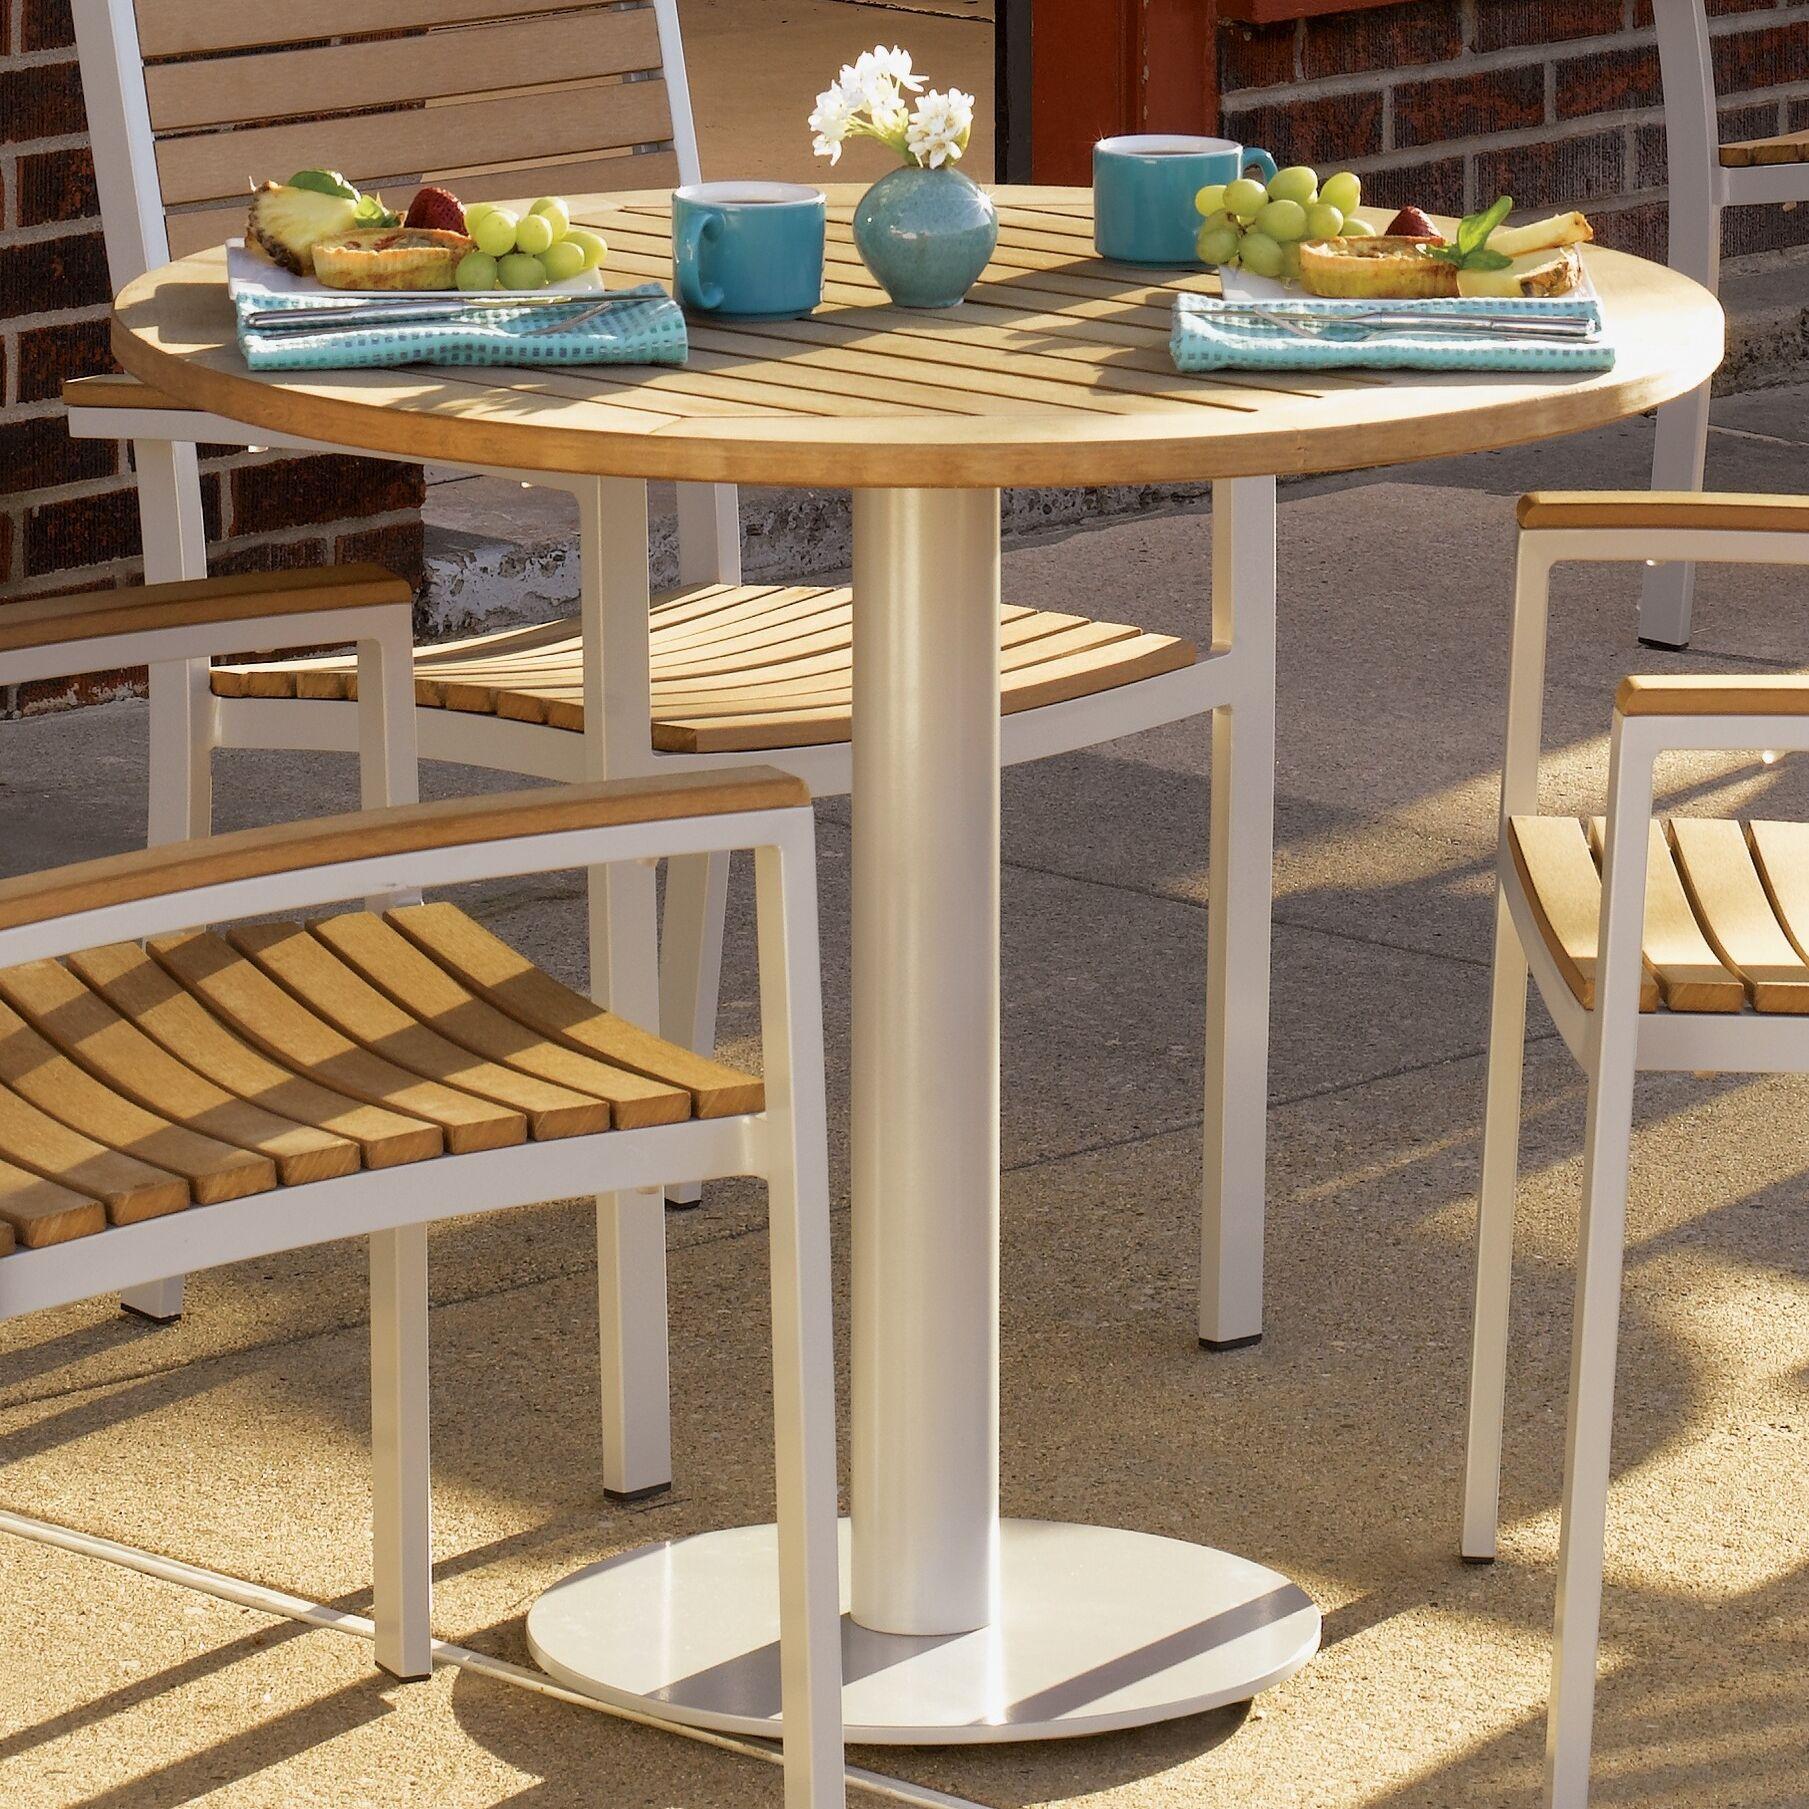 Farmington Bistro Table Table Top Size: 36